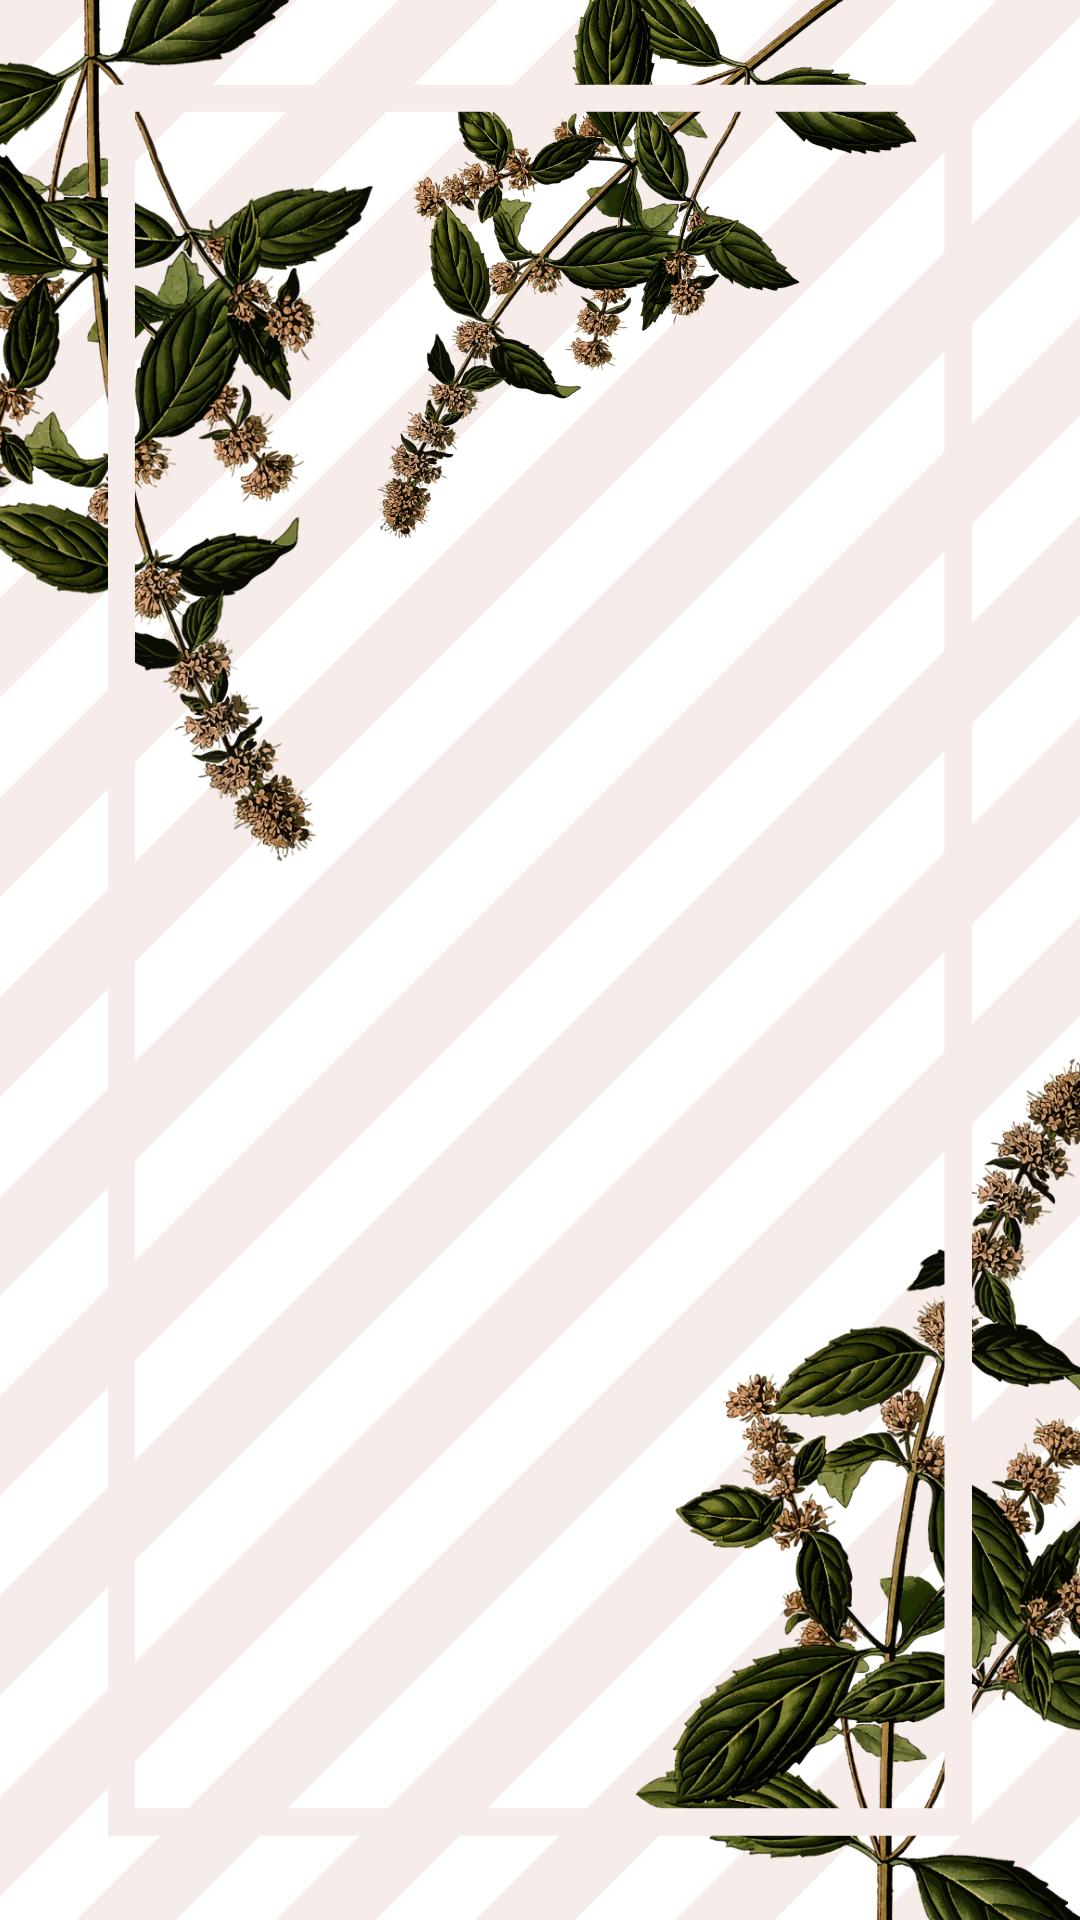 Wallpapers Para Celular Feminino Floral E Tumblr Papeis